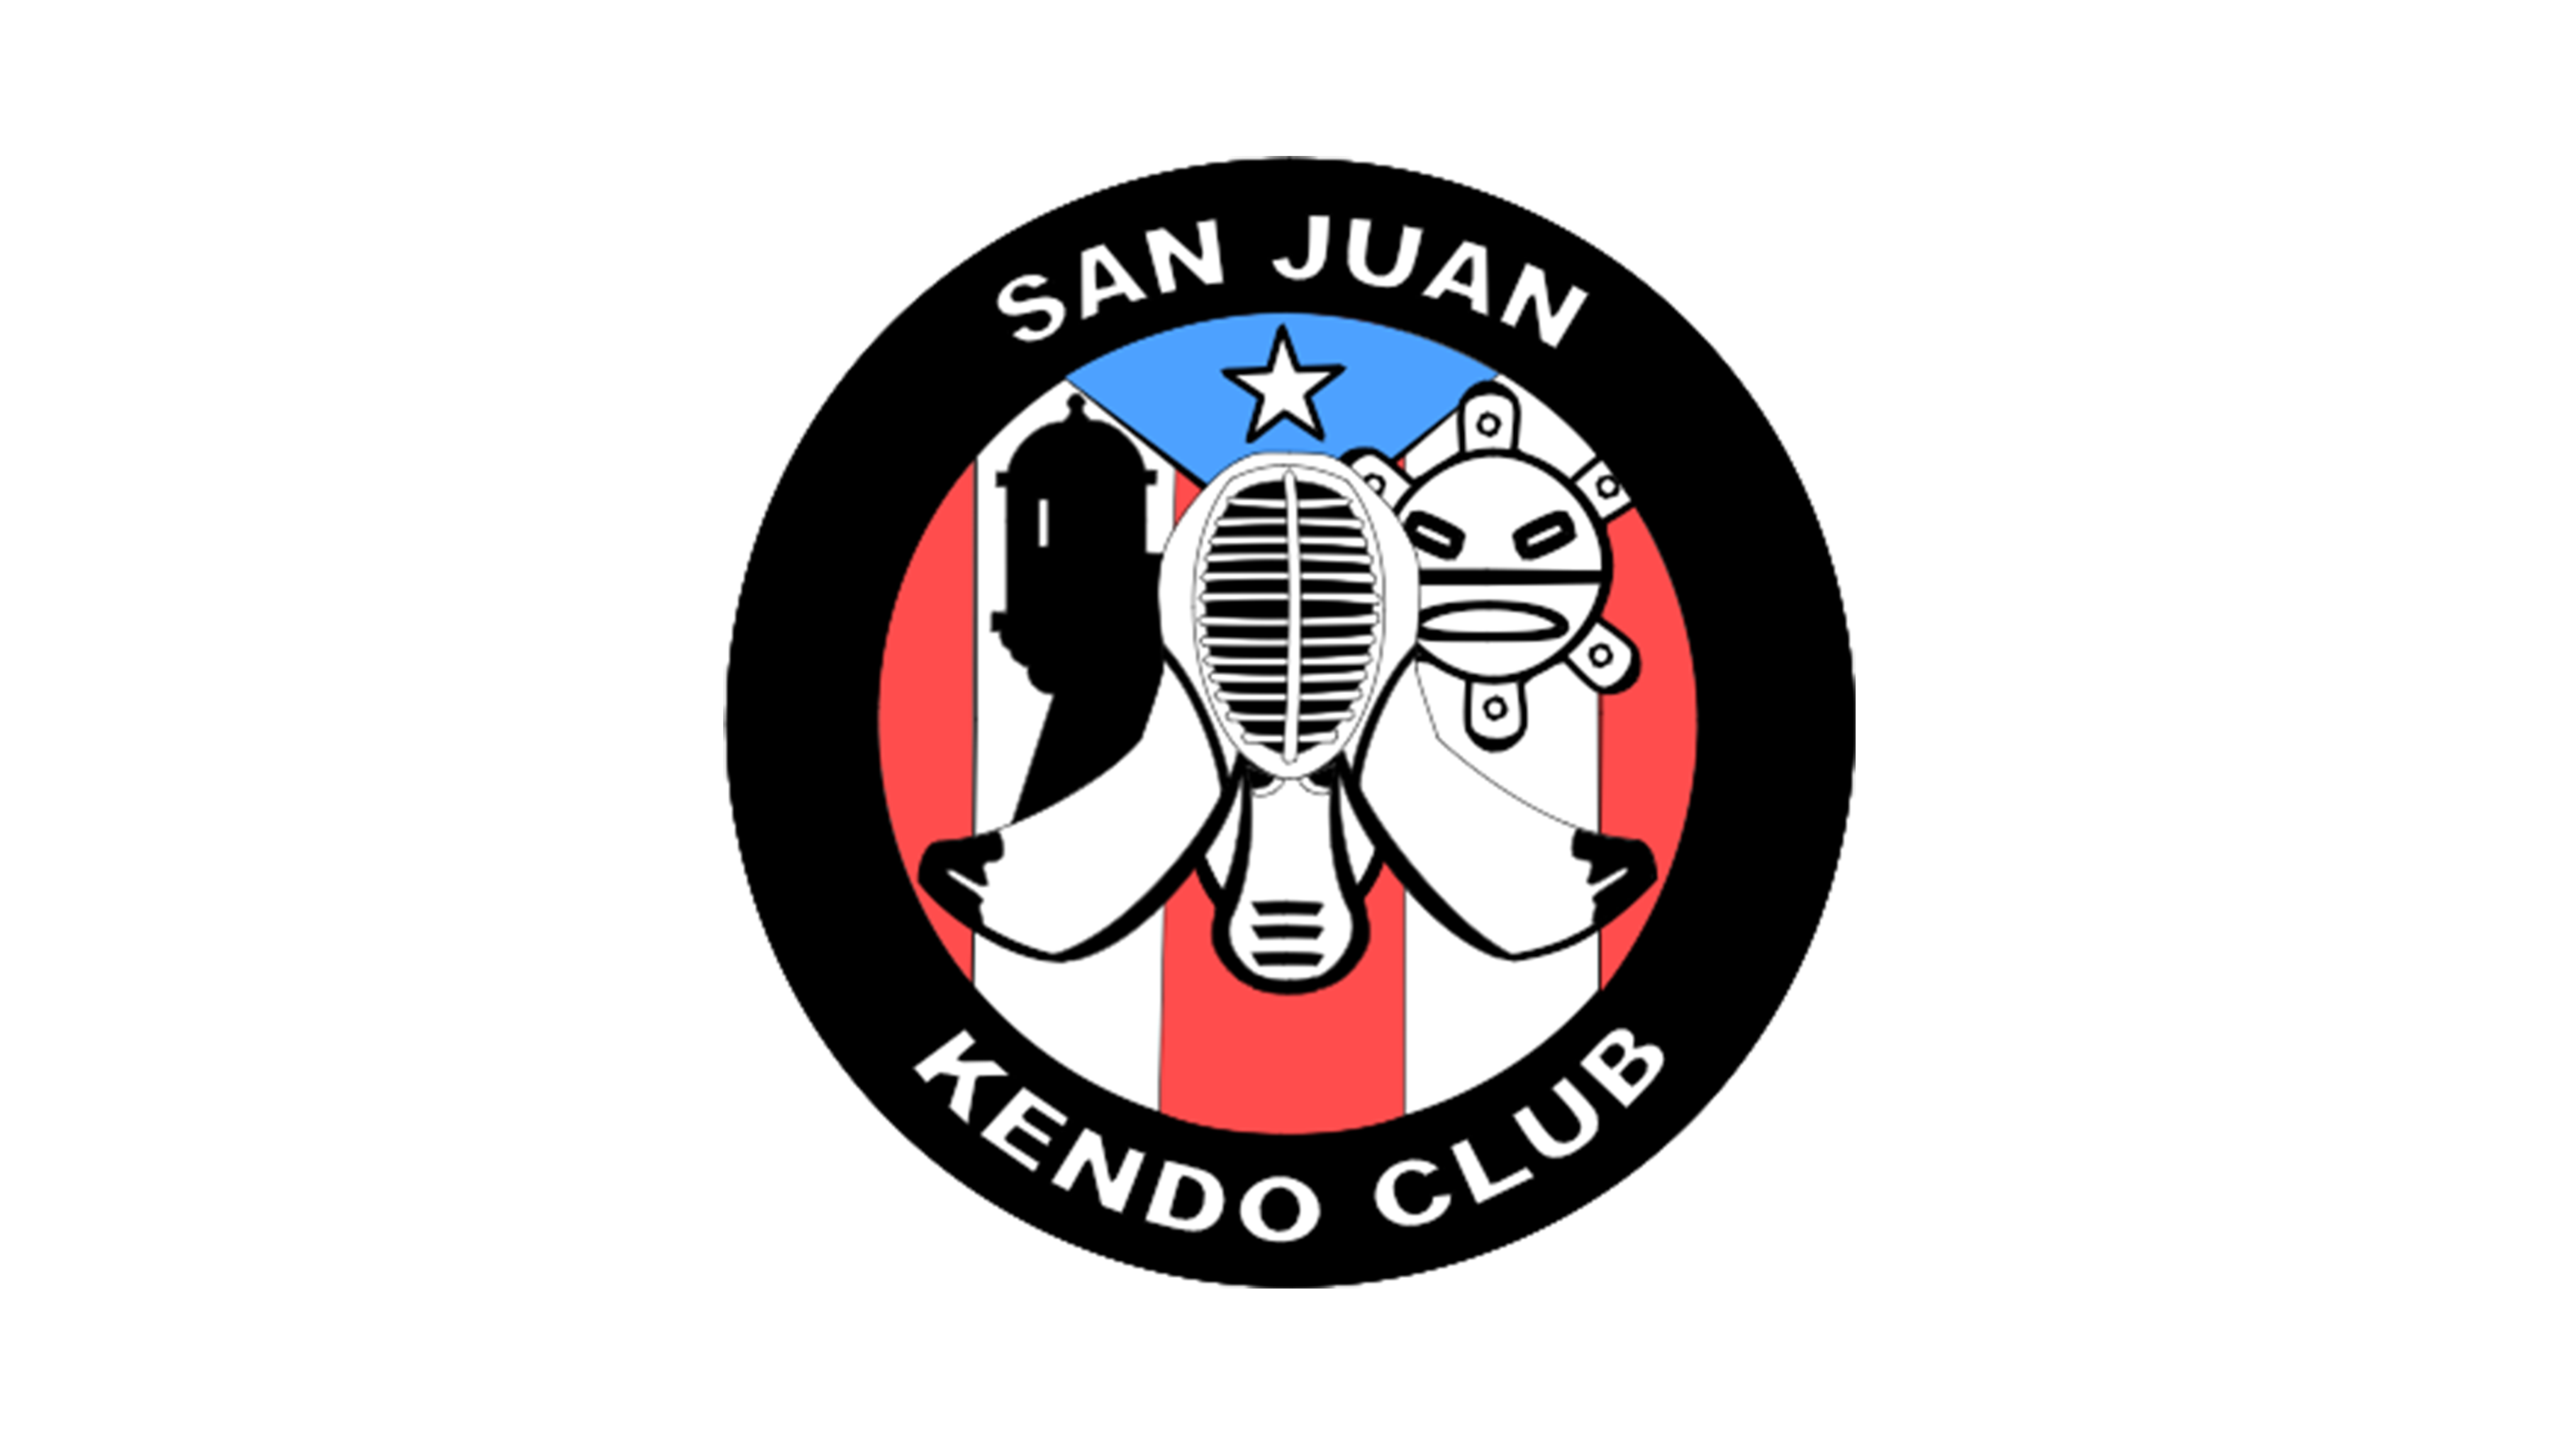 San Juan Kendo Club